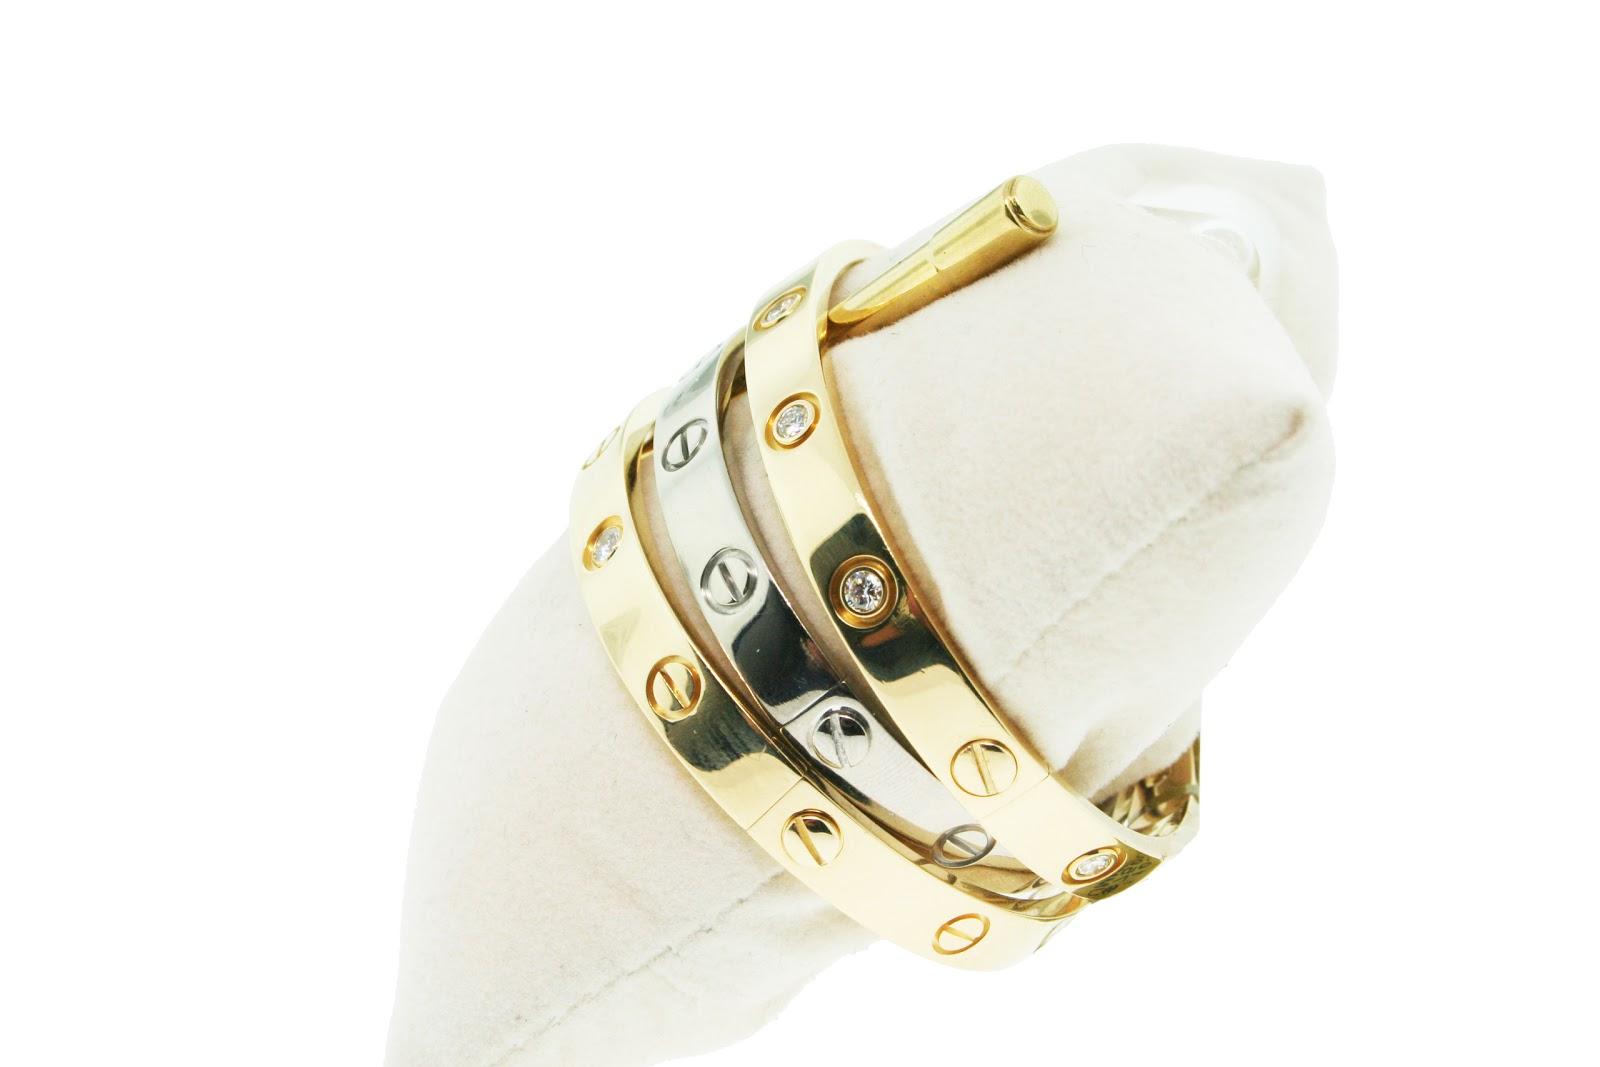 Bracelet Zipper Galleries: Cartier Love Bracelet Price